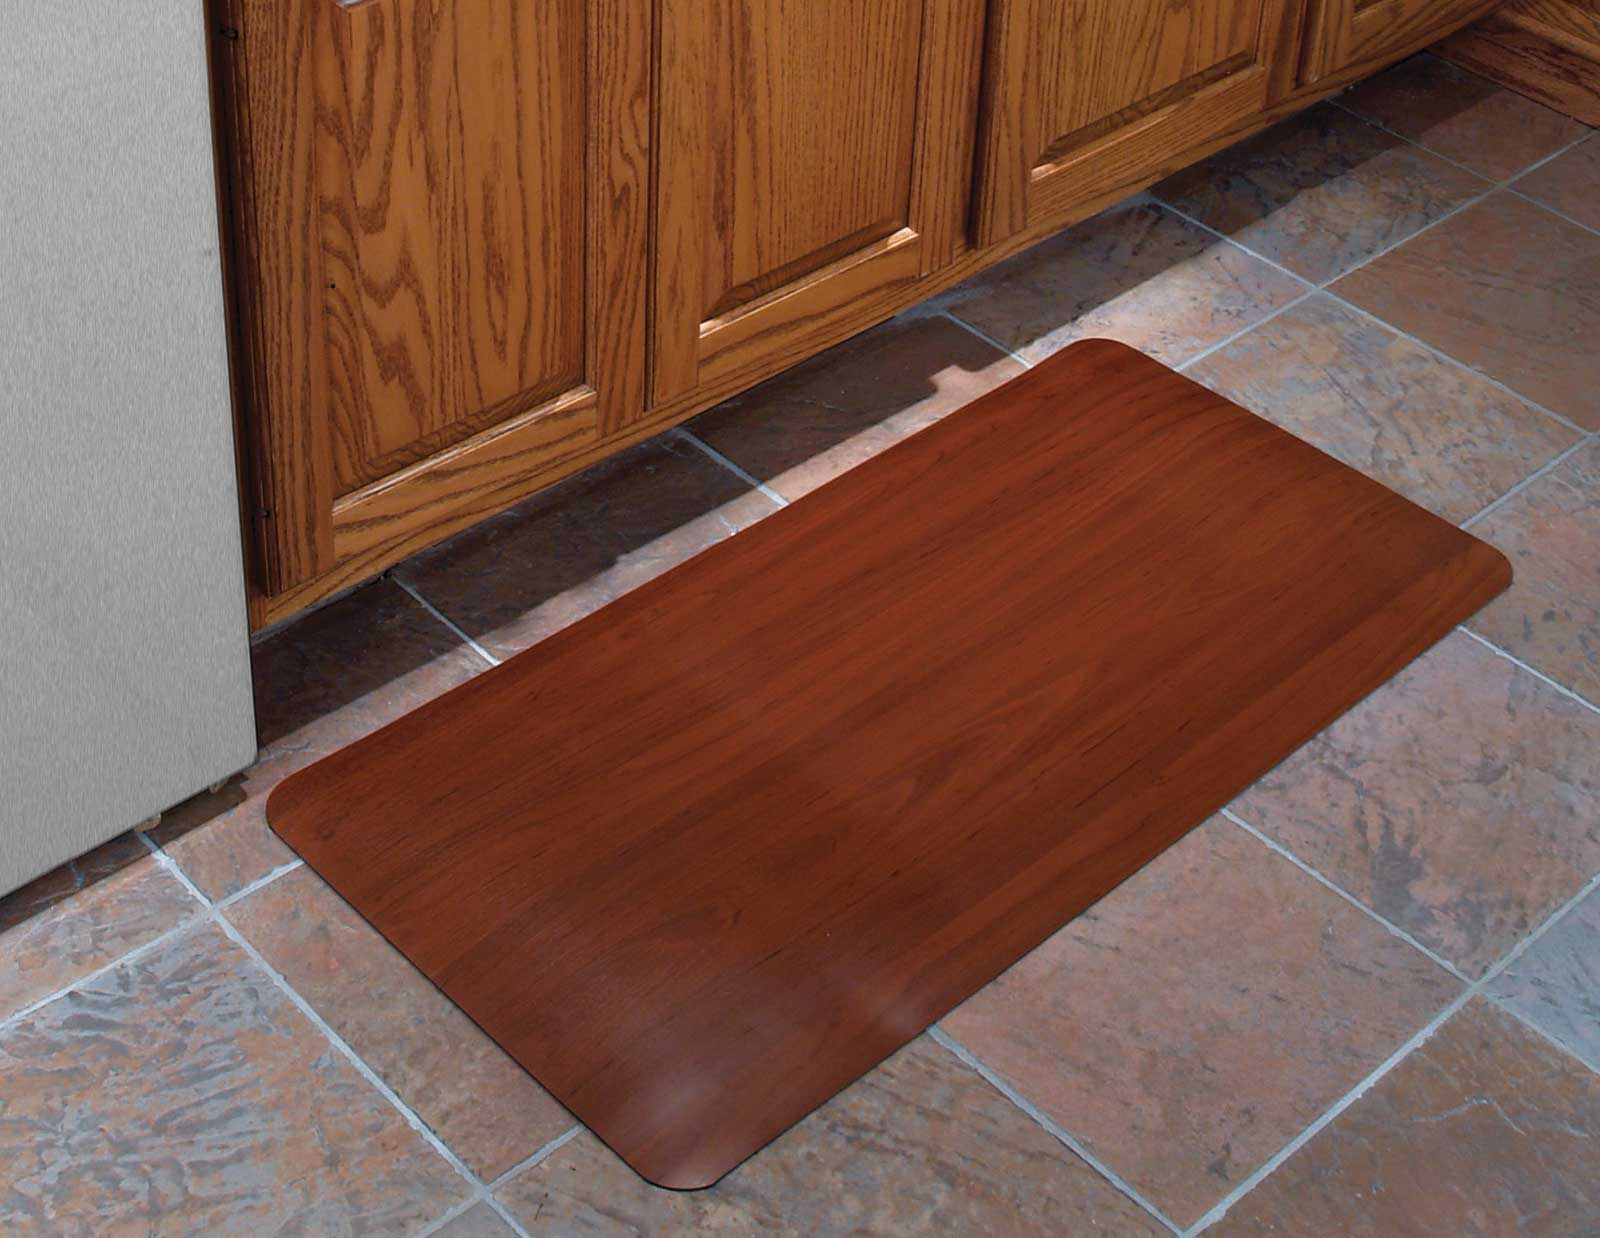 24x36 Inch Cushioned Floor Mat  Wood Grain in Kitchen Mats